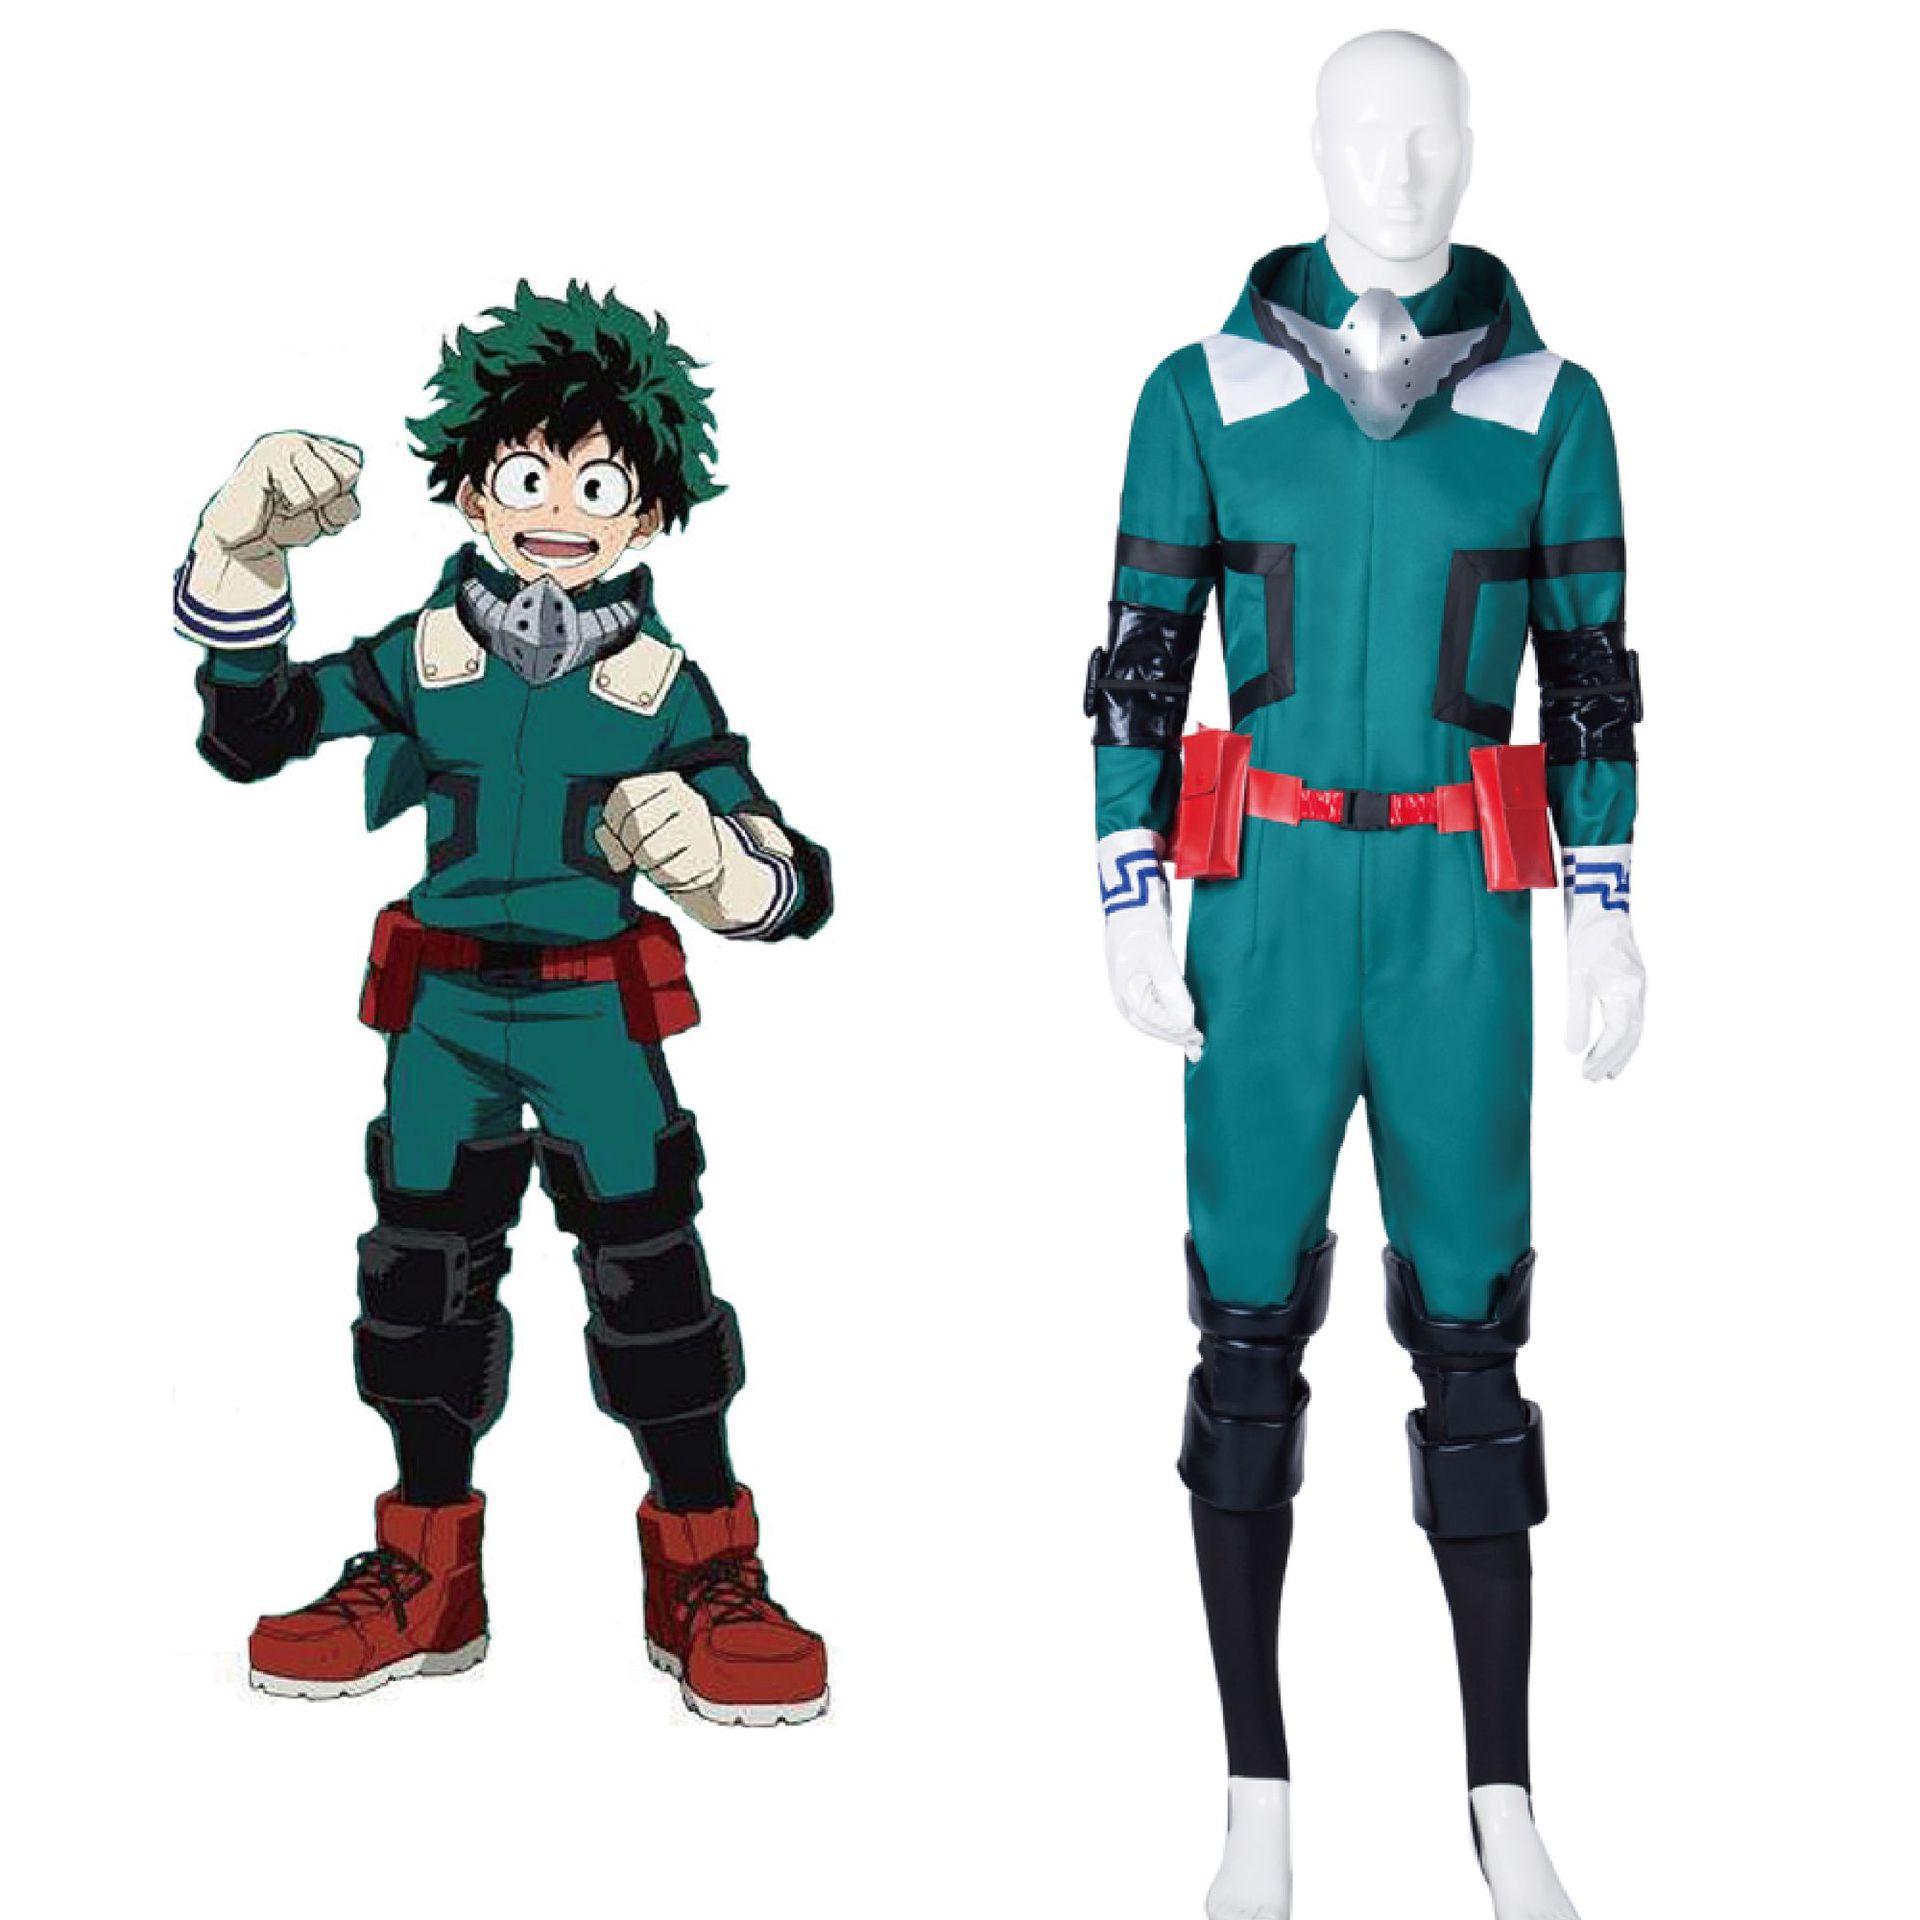 Anime my hero academia boku no hero academia 미도리 야 이즈 쿠 데쿠 코스프레 의상 배틀 슈트 남자 점프 슈트 카니발 풀 세트